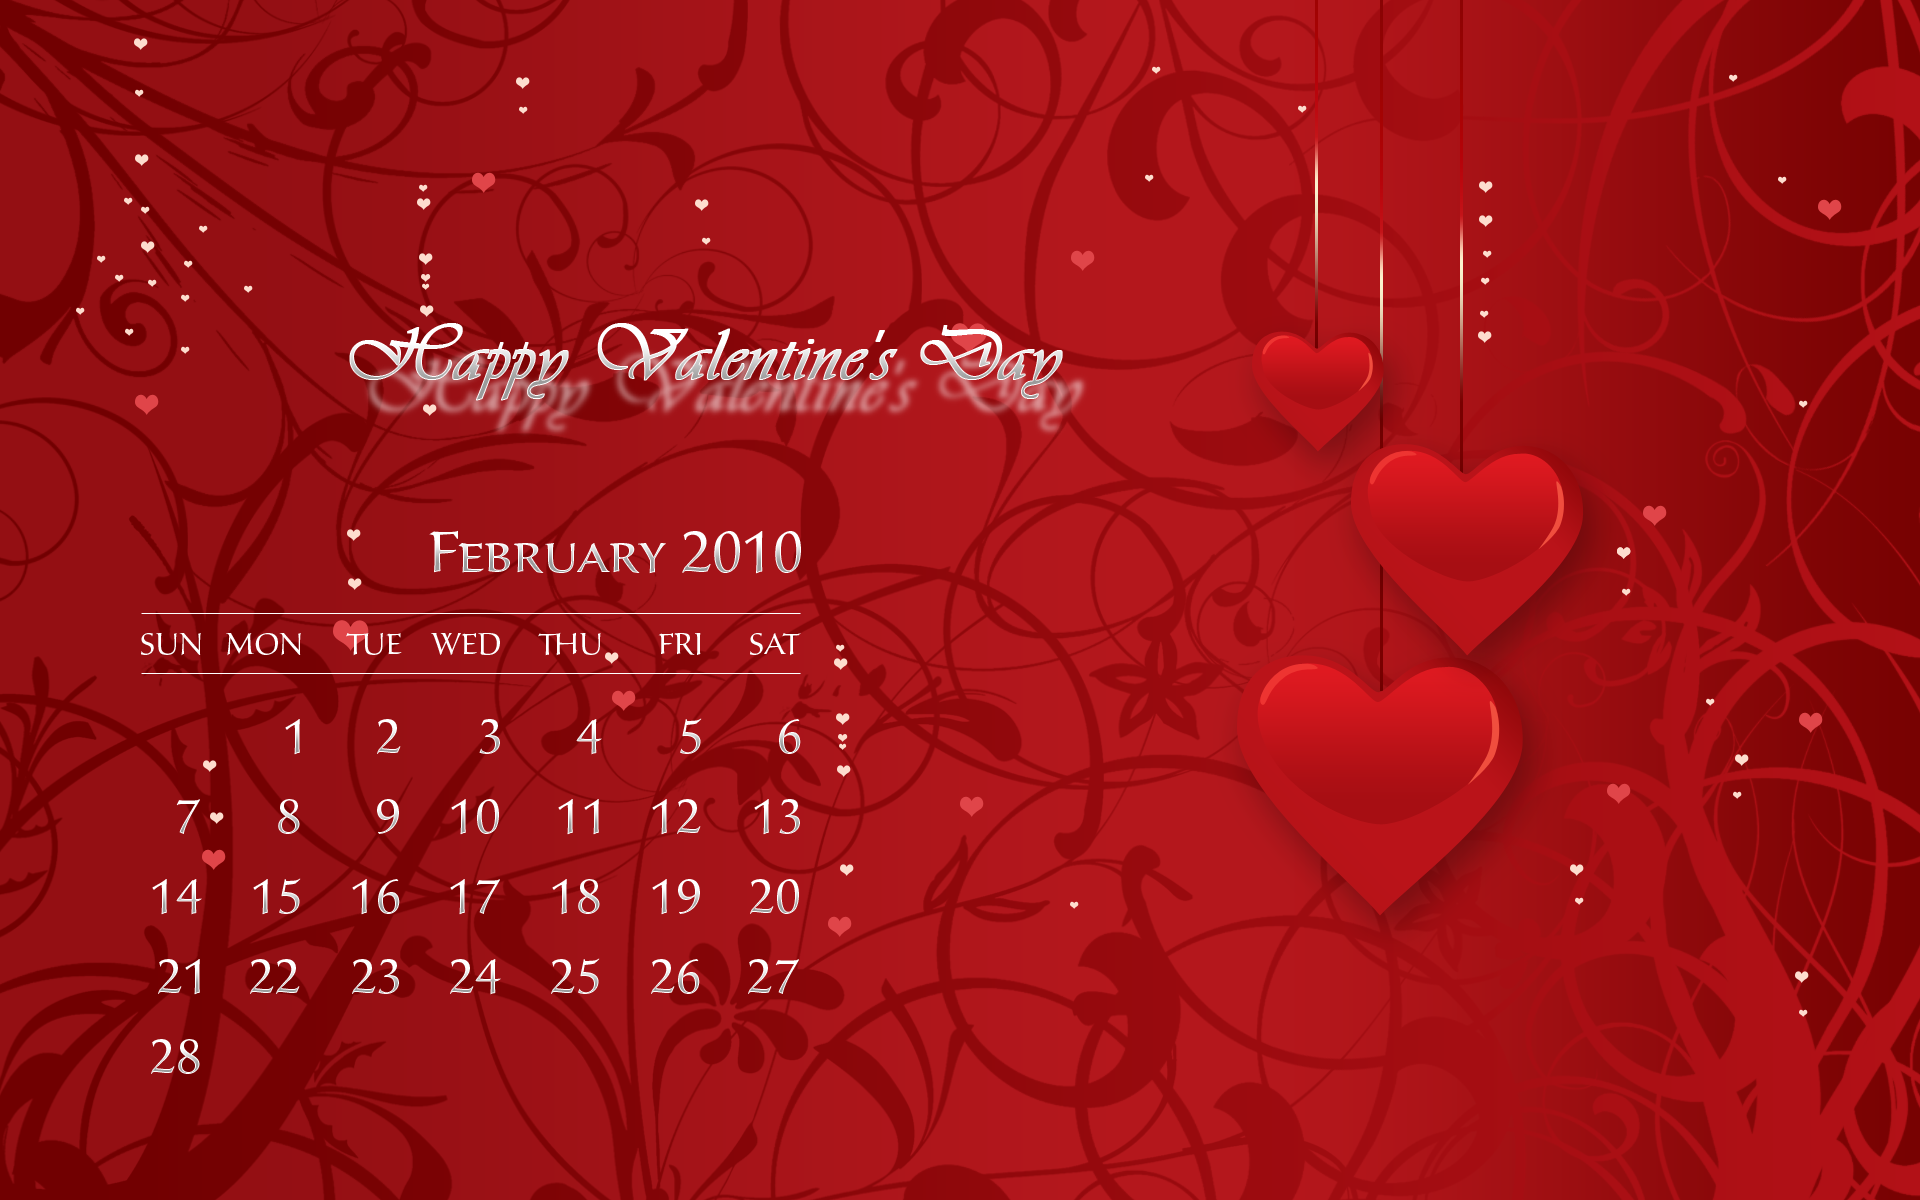 Desktop Wallpaper Calendar February 2010 Photoshop Tutorials 1920x1200